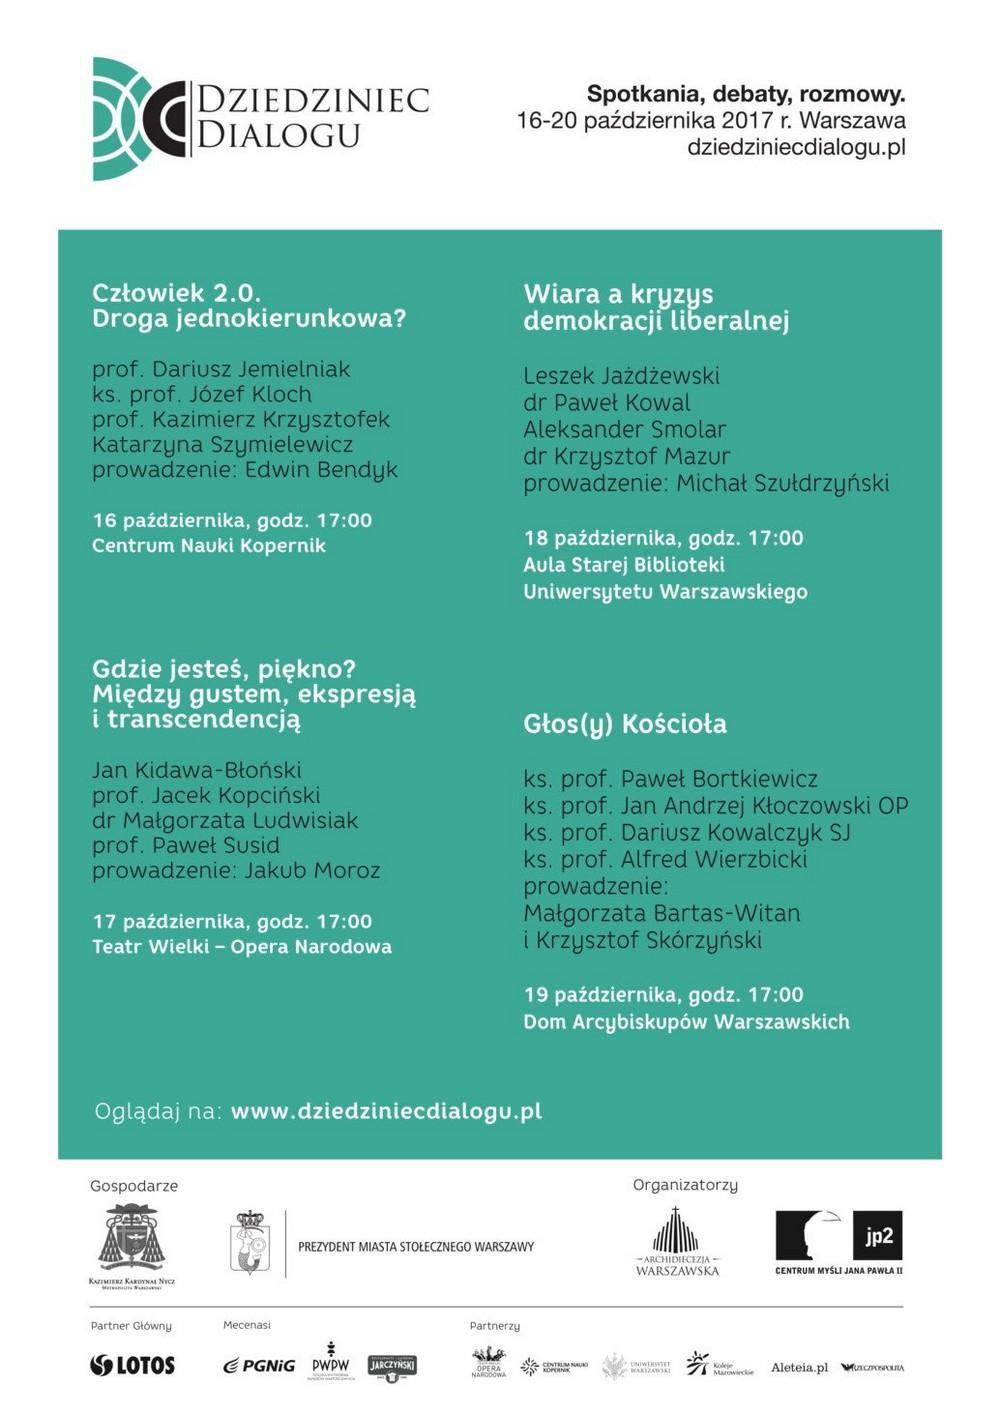 DziedziniecDialogu2017_program